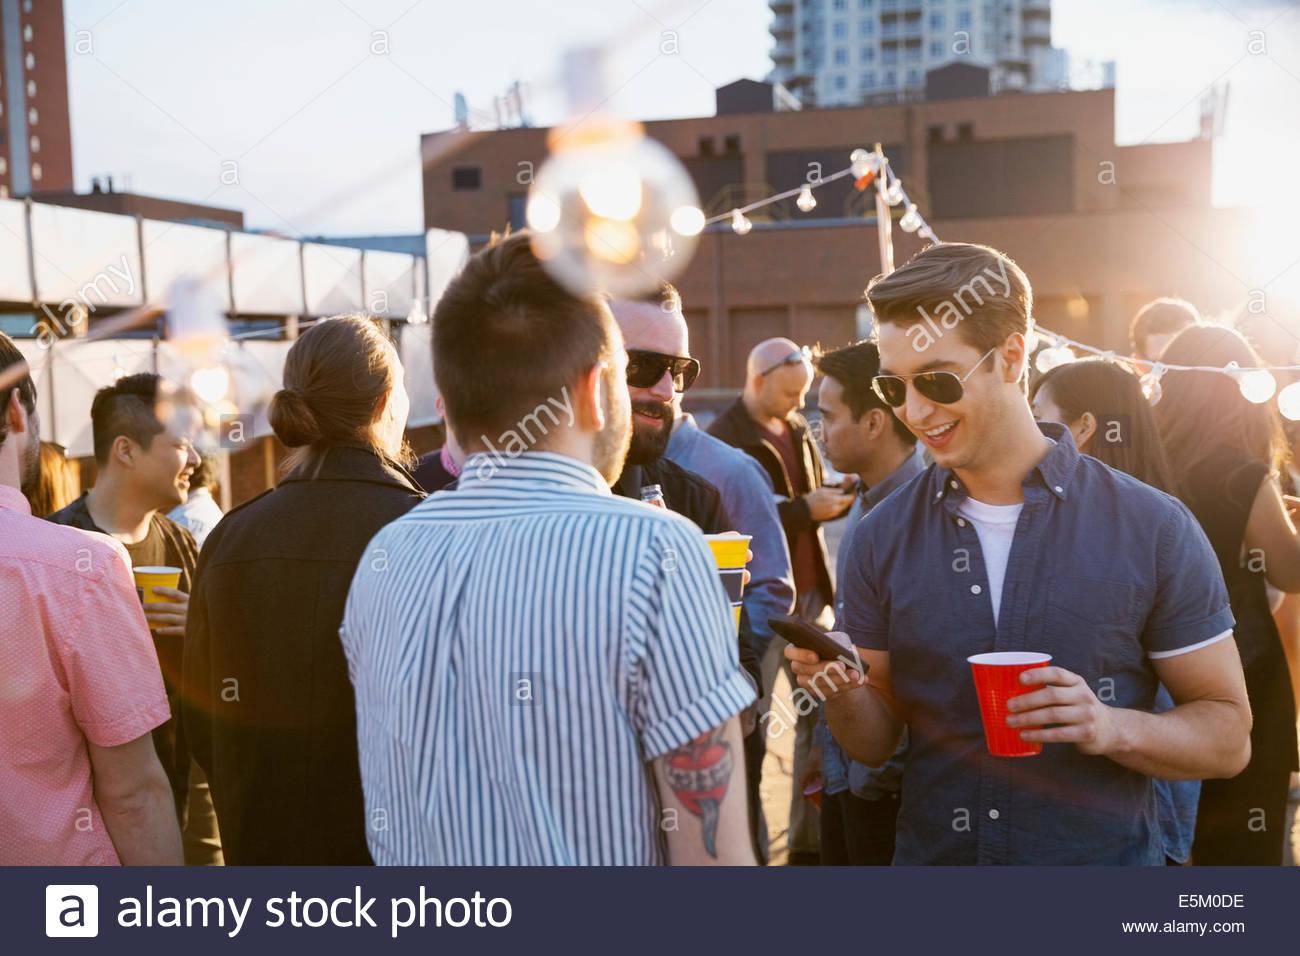 Crowd enjoying urban rooftop party - Stock Image